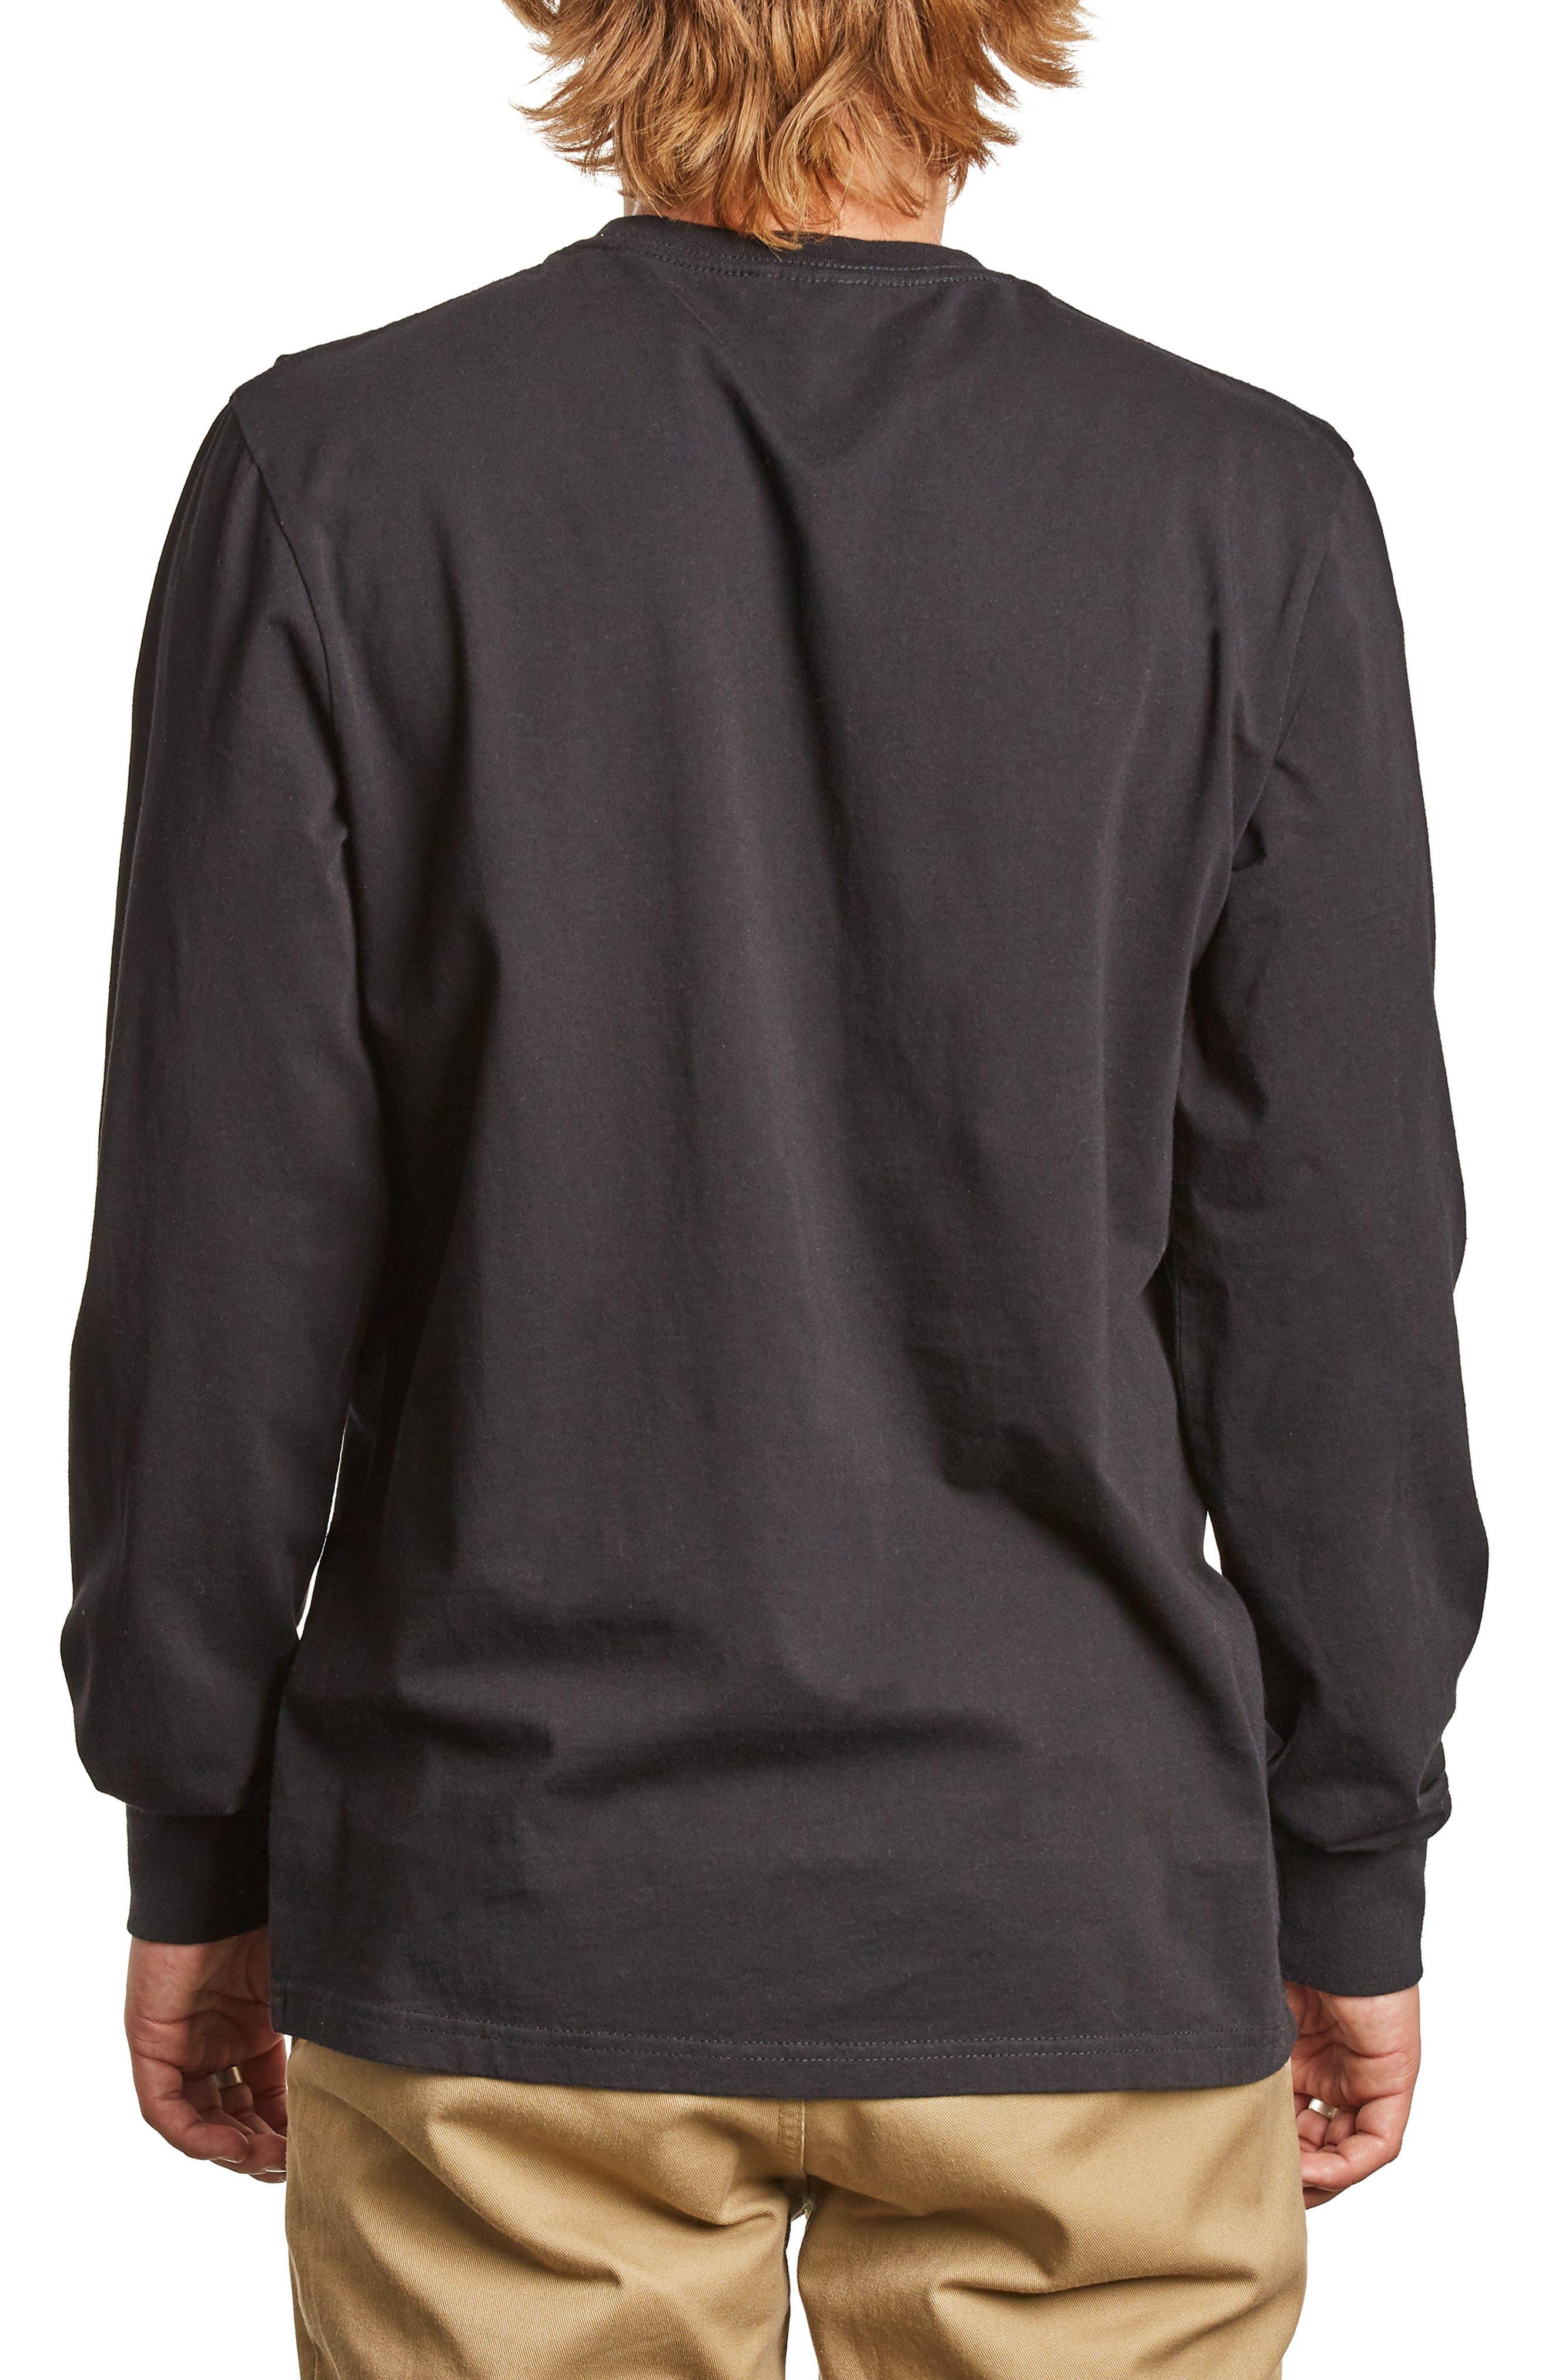 Garth Premium T-Shirt,                             Alternate thumbnail 2, color,                             001